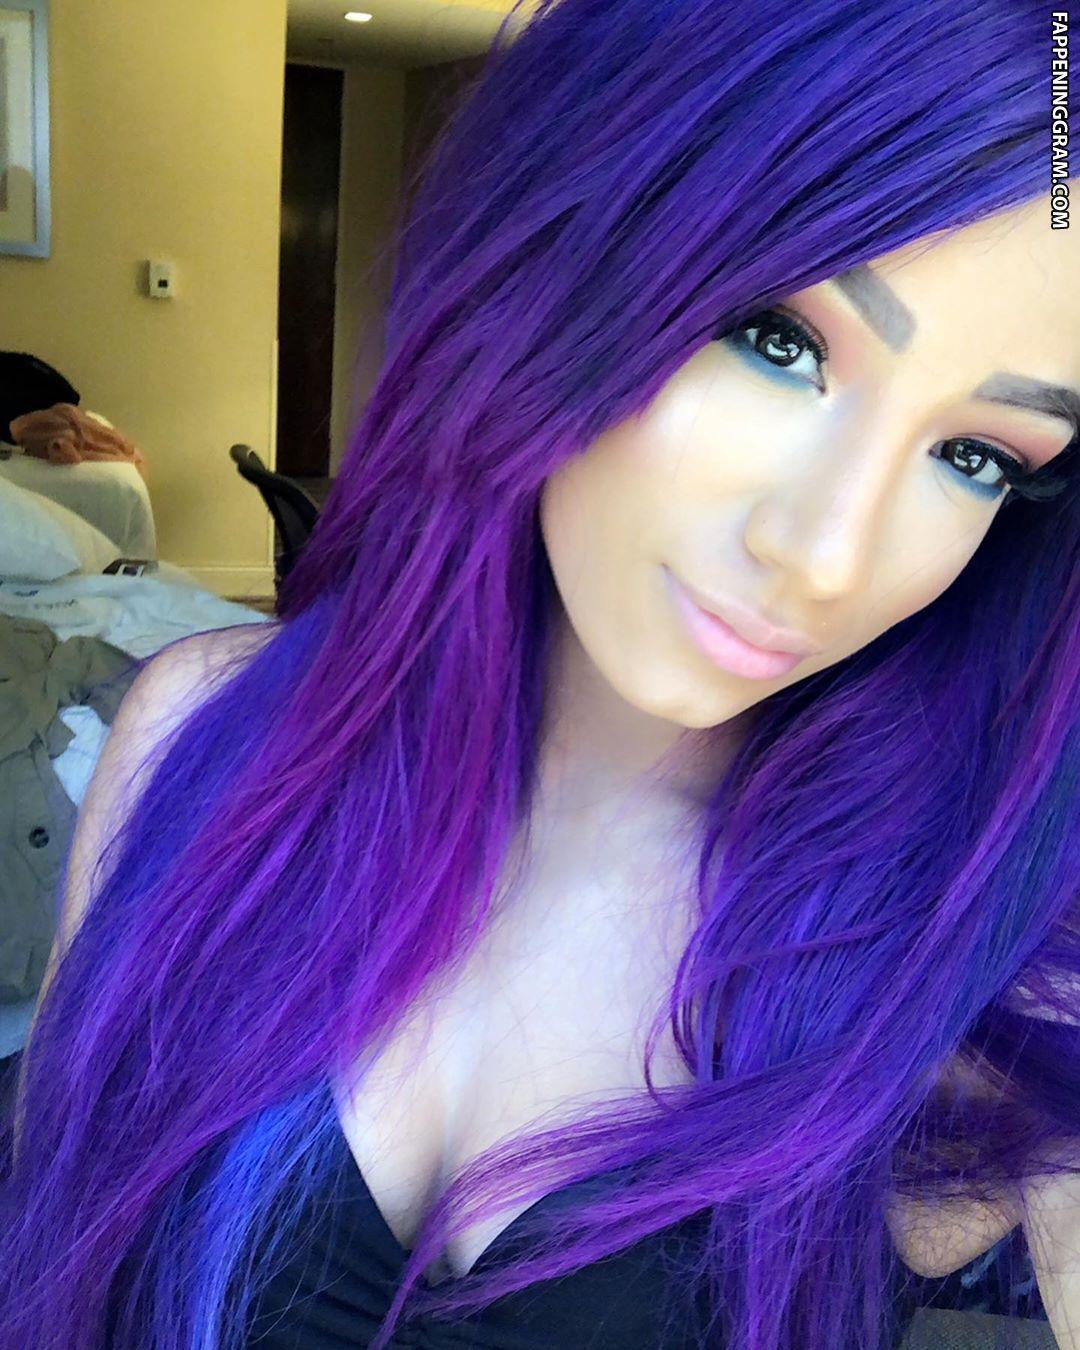 WWE - Divas Fight Club - HawtCelebs